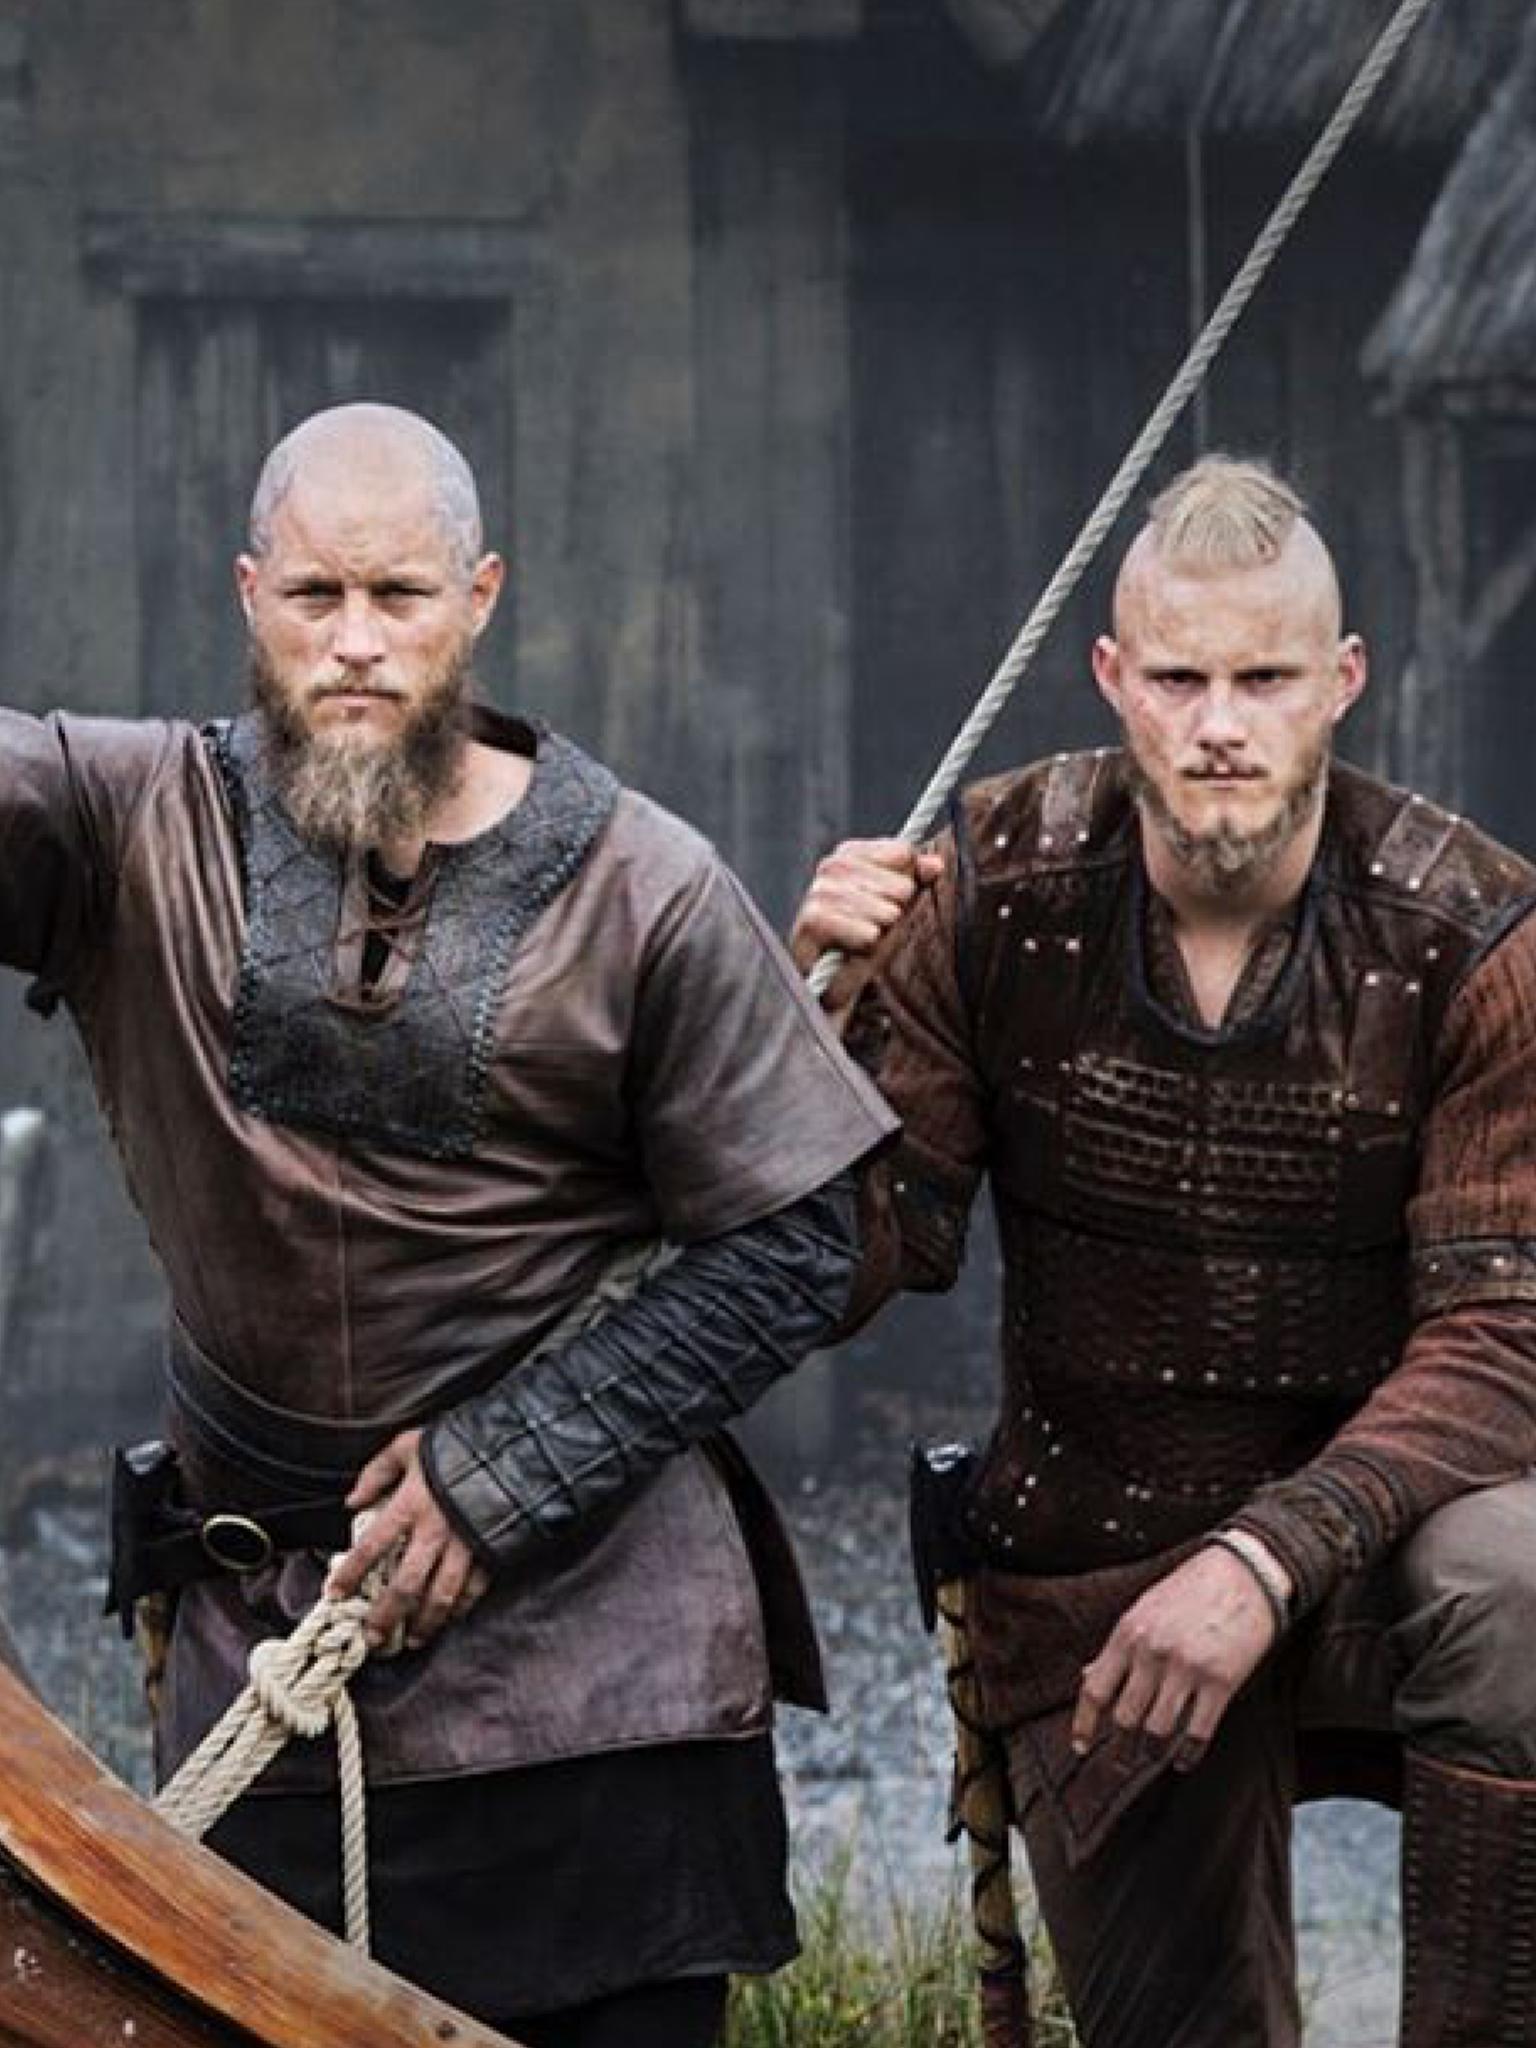 Ragnar Bjorn Vater Sohn Verbunden Ein Leben Lang Wikinger Ragnar Ragnar Ragnar Lothbrok